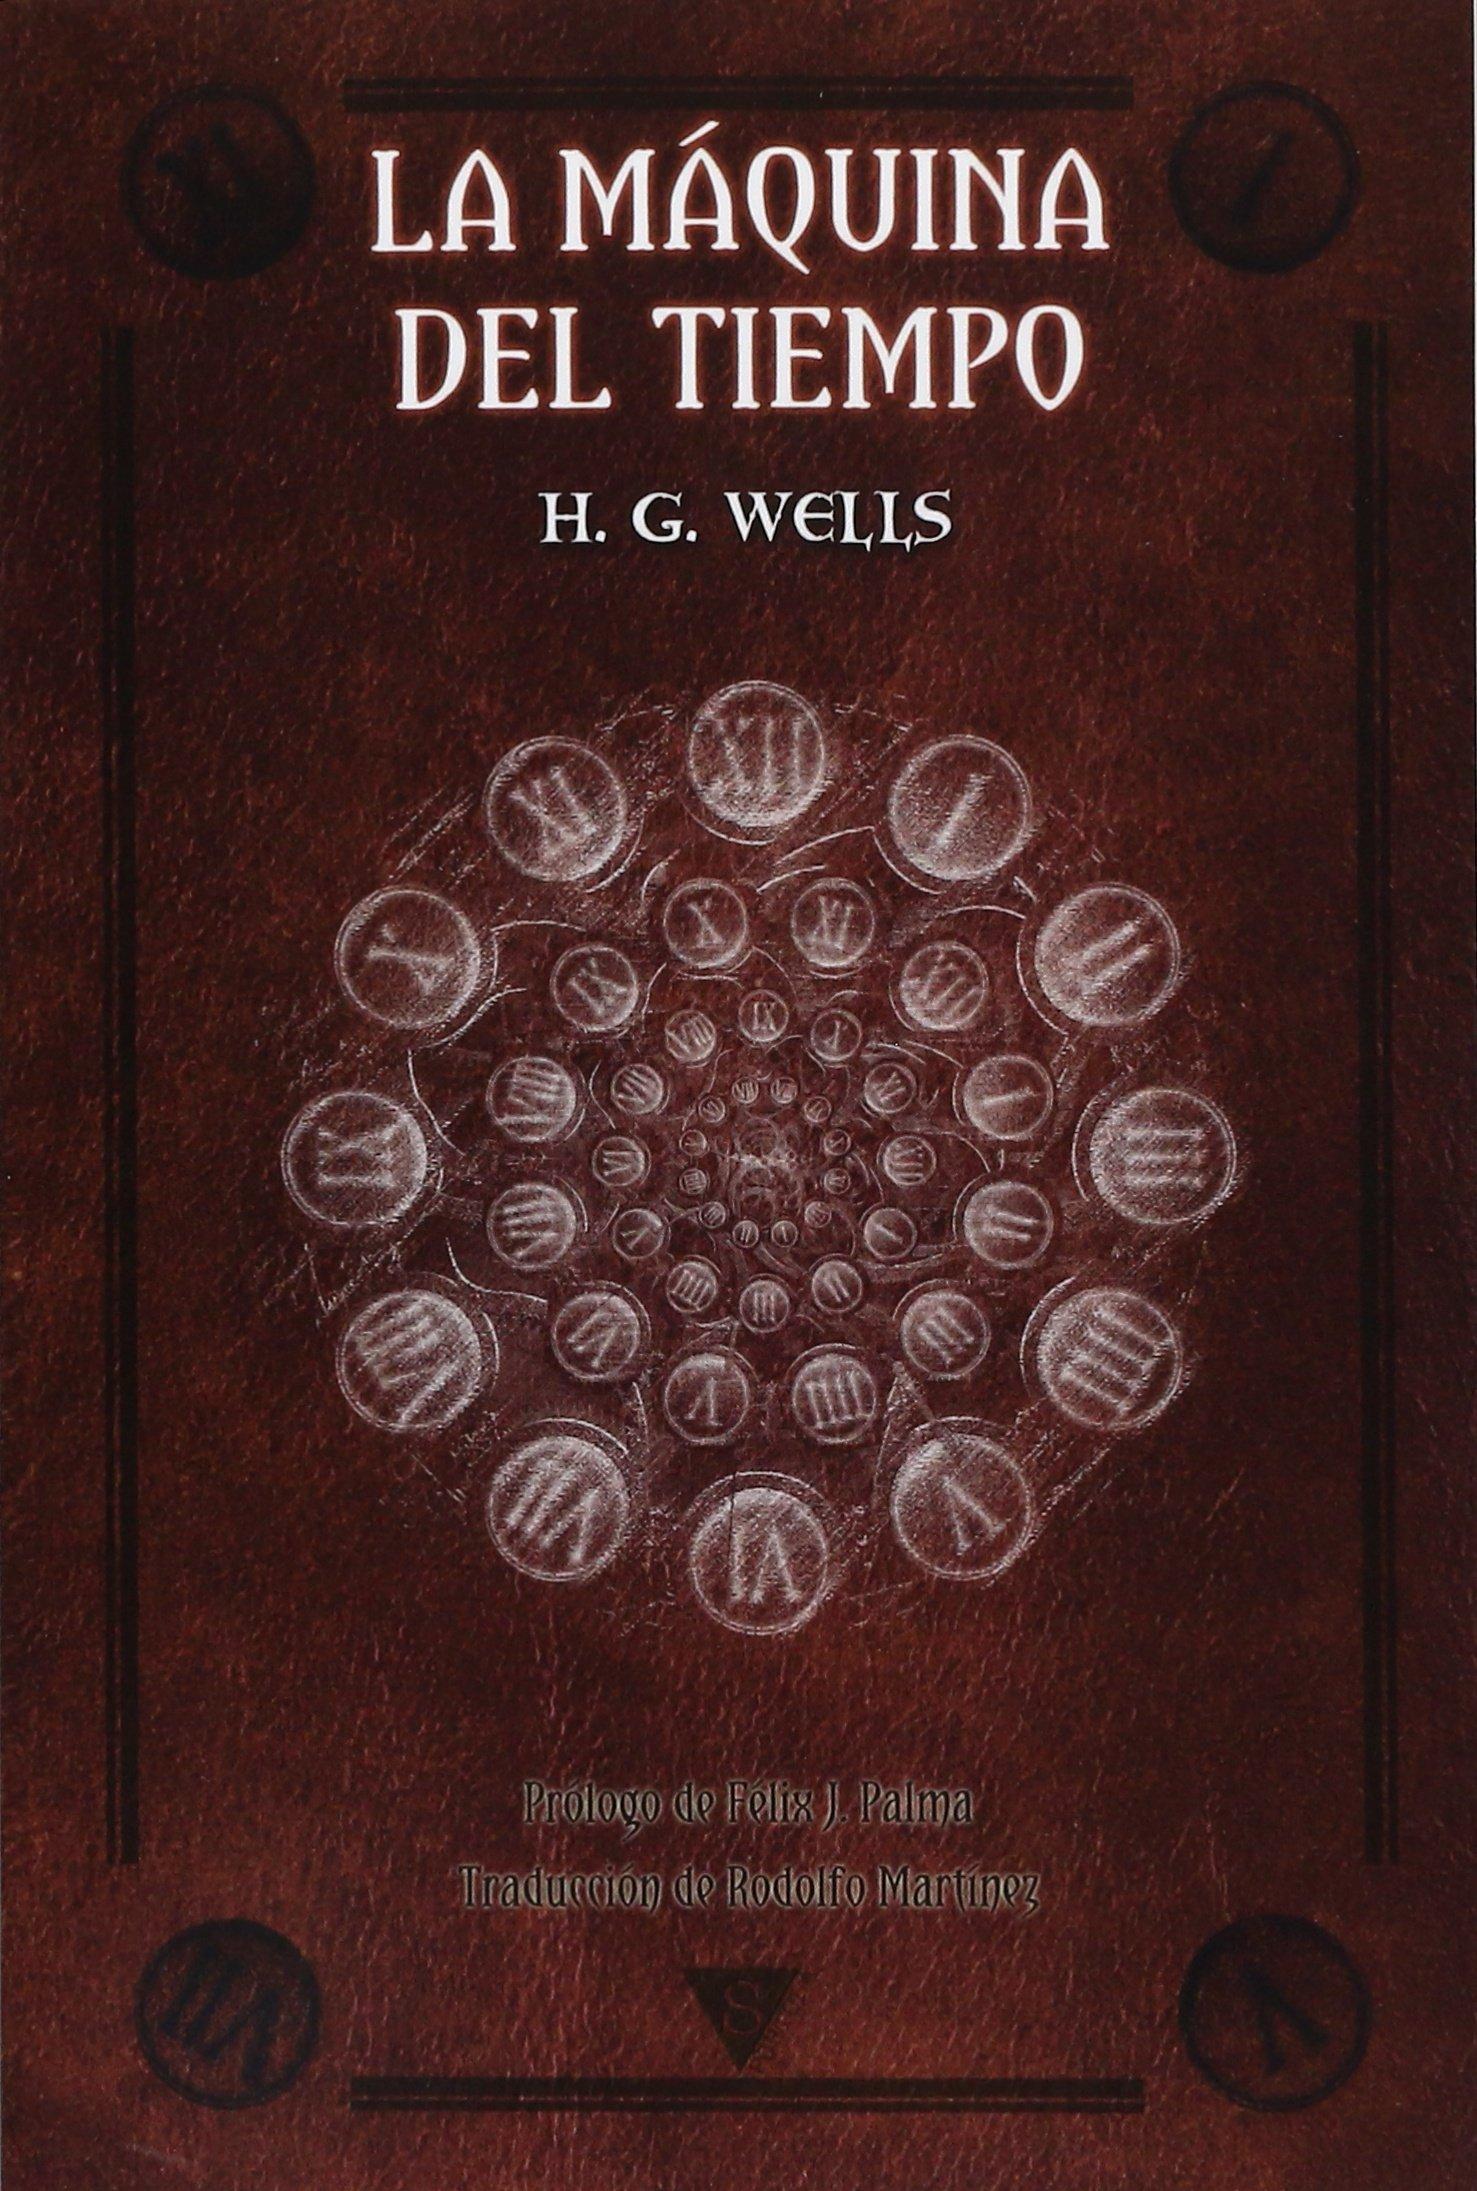 La máquina del tiempo (Spanish Edition): H. G. Wells, Rodolfo Martínez, Félix J. Palma: 9788415988762: Amazon.com: Books